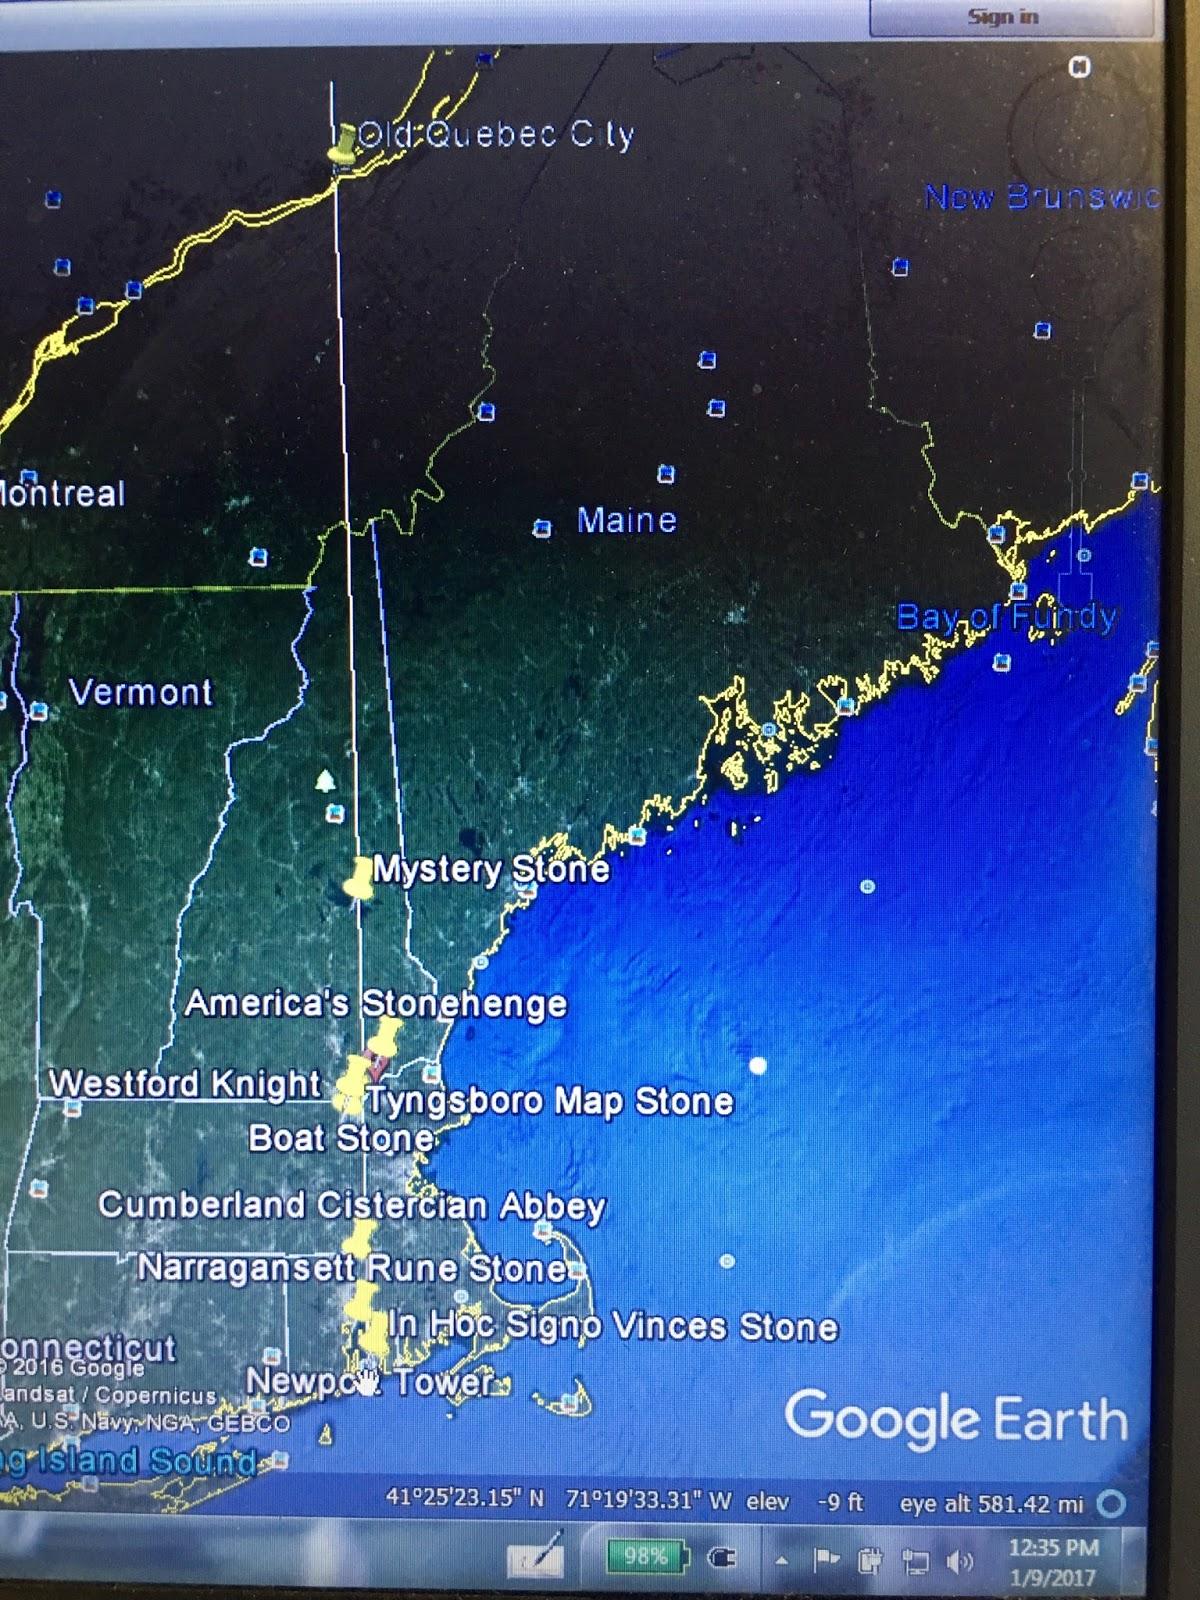 Public Land Survey System How To Get Latitude And Longitude From - Map with latitude and longitude google